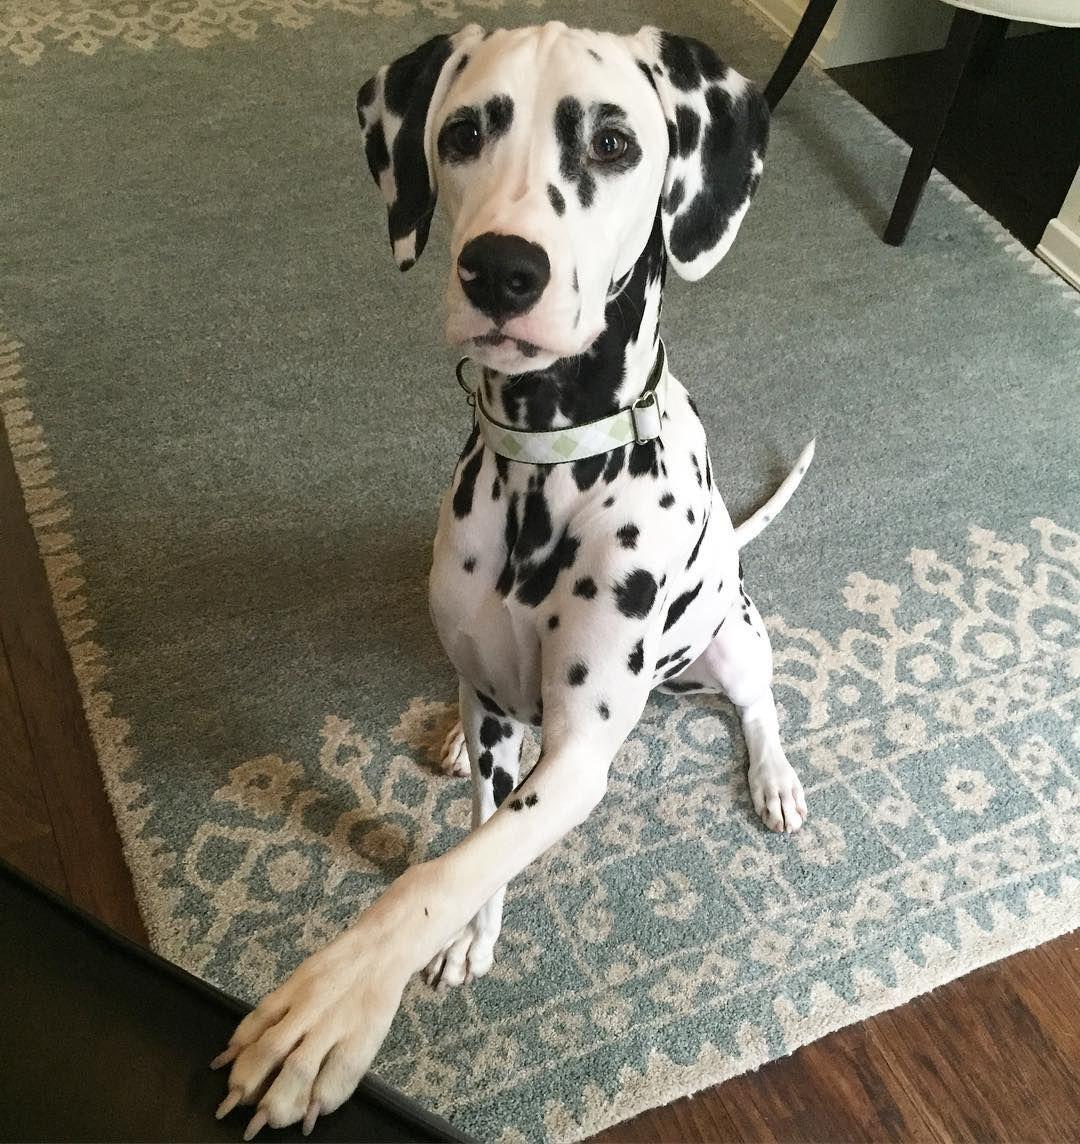 I give paw. You give treat. #giveandtake  #jackson #dalmatian #dalmatianpuppy @dream.n.design #lovemyspots #givepaw #pbpets #lovemypotterybarn by jackson_the_dalmatian #lacyandpaws